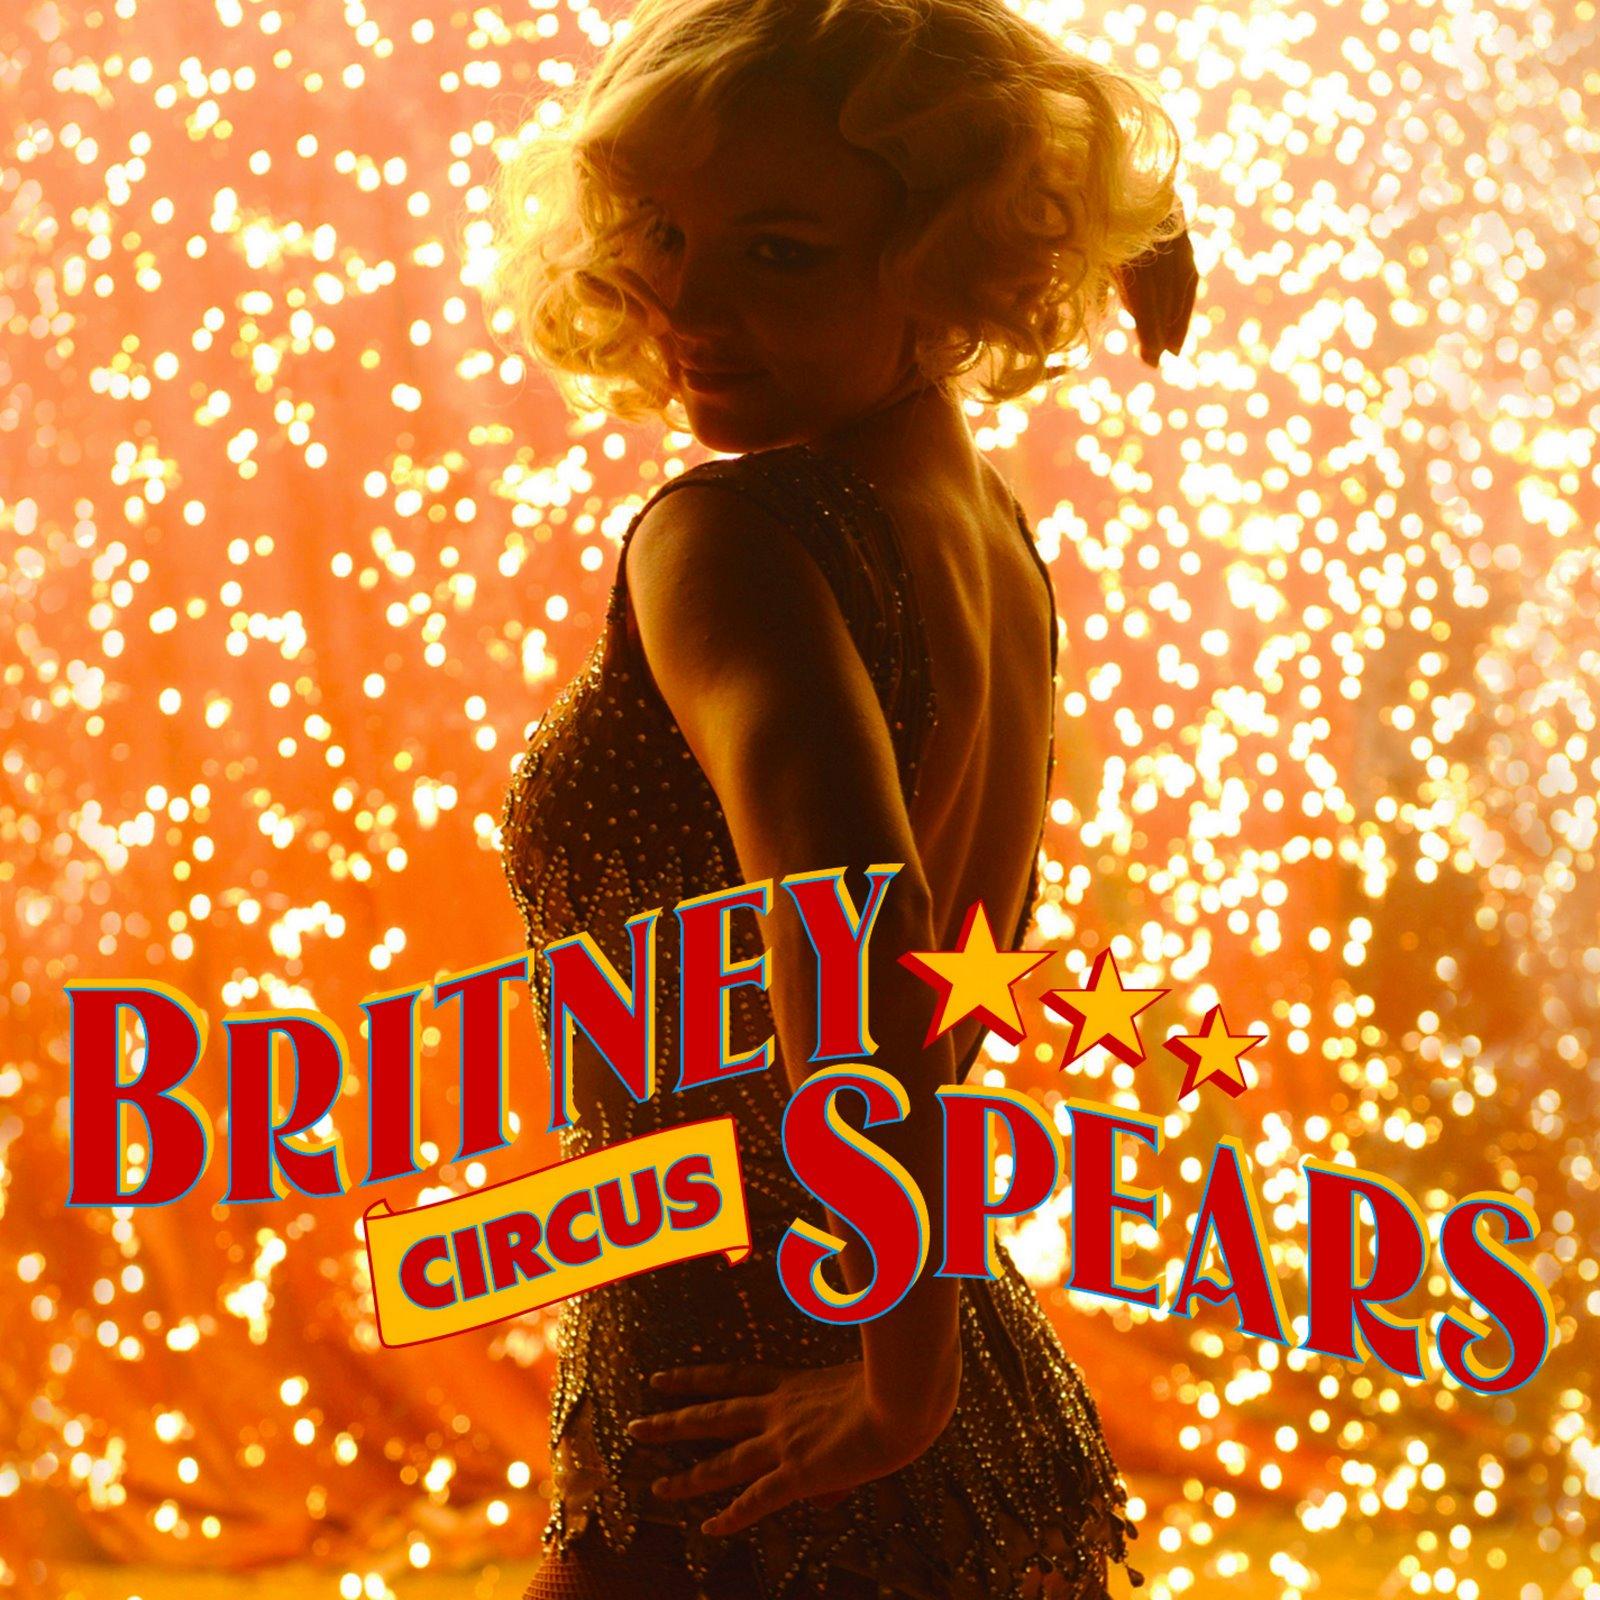 http://4.bp.blogspot.com/-siyp9f4P1lE/T63lHVNr-6I/AAAAAAAAAYk/B5KGVIddjKo/s1600/Britney%2BSpears%2B-%2BCircus%2B_Single_.jpg